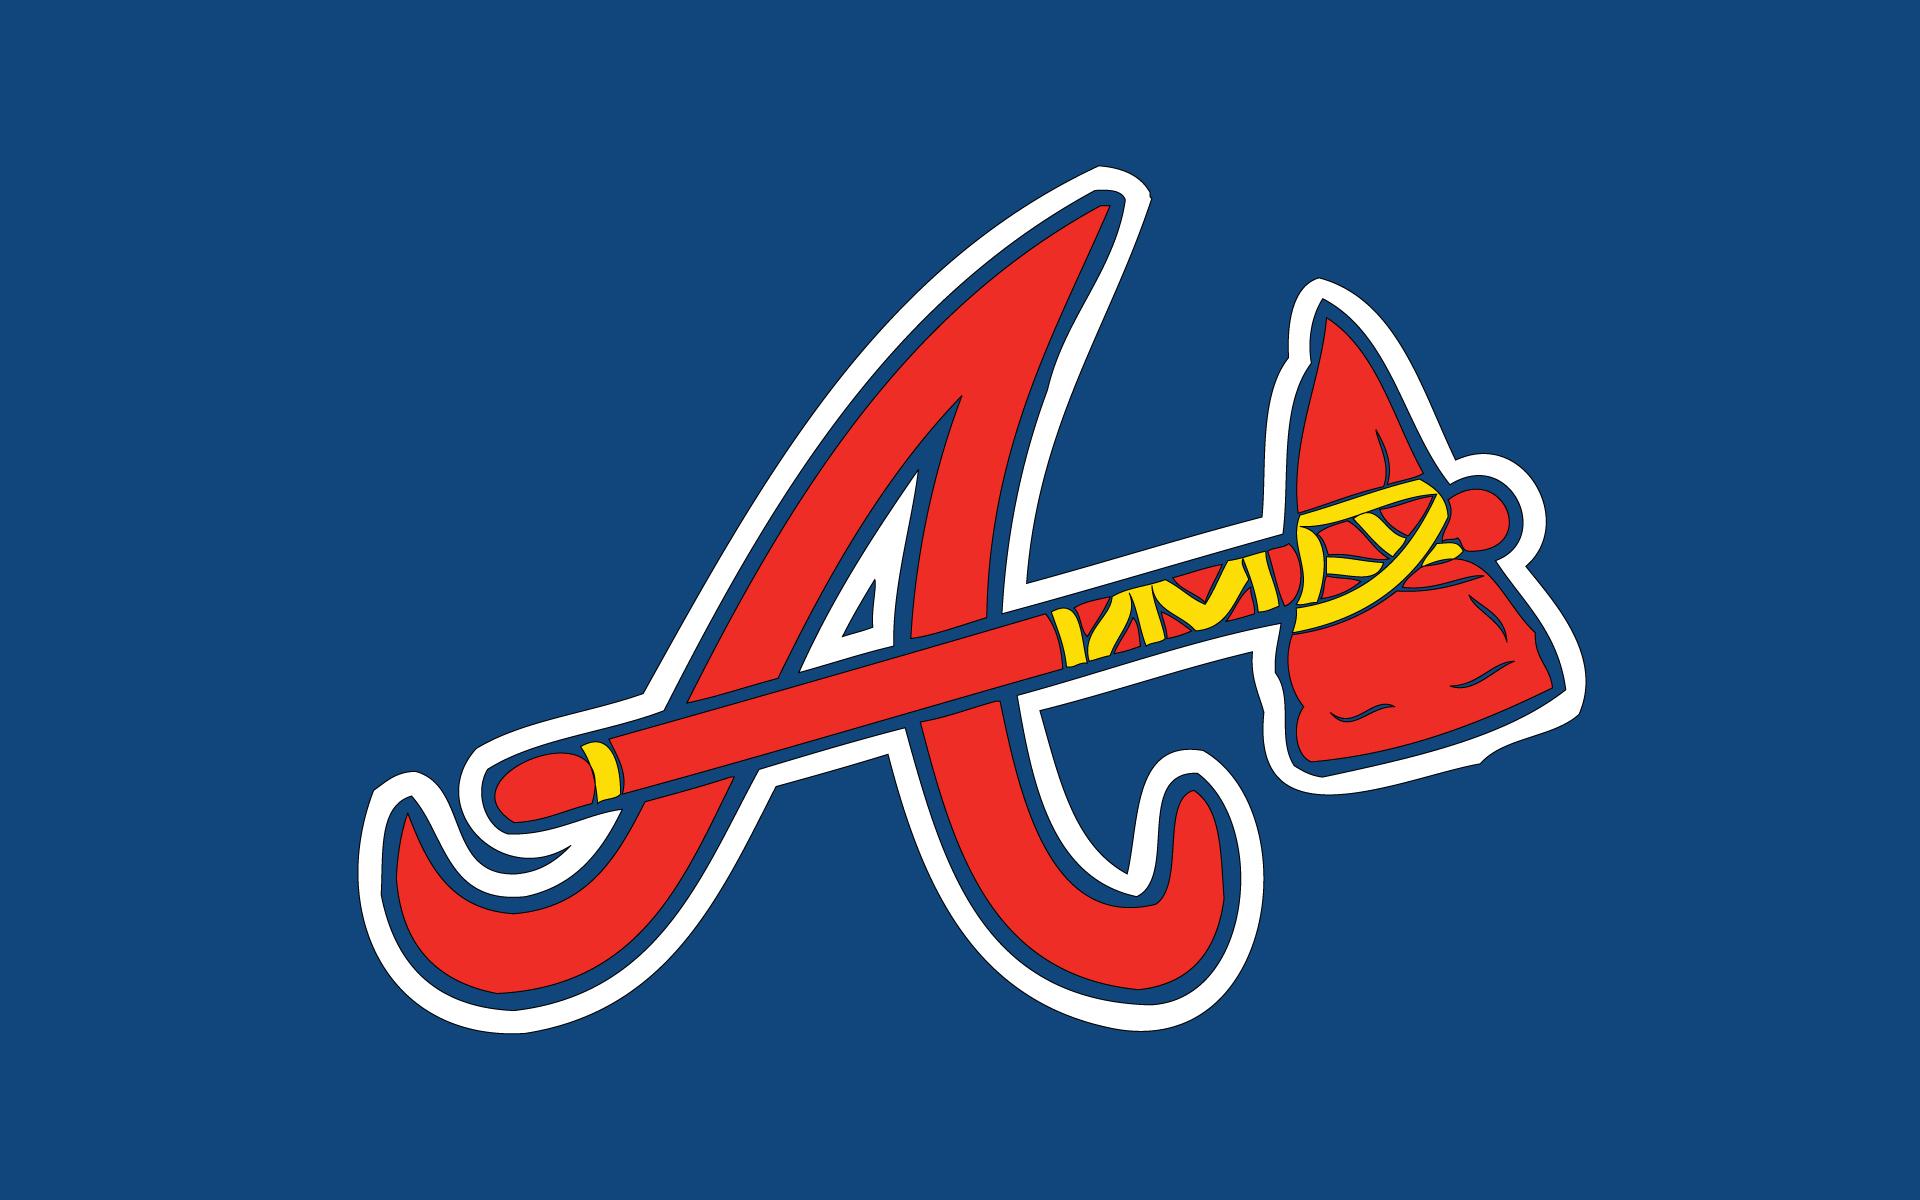 [42+] Atlanta Braves Logo Wallpaper on WallpaperSafari